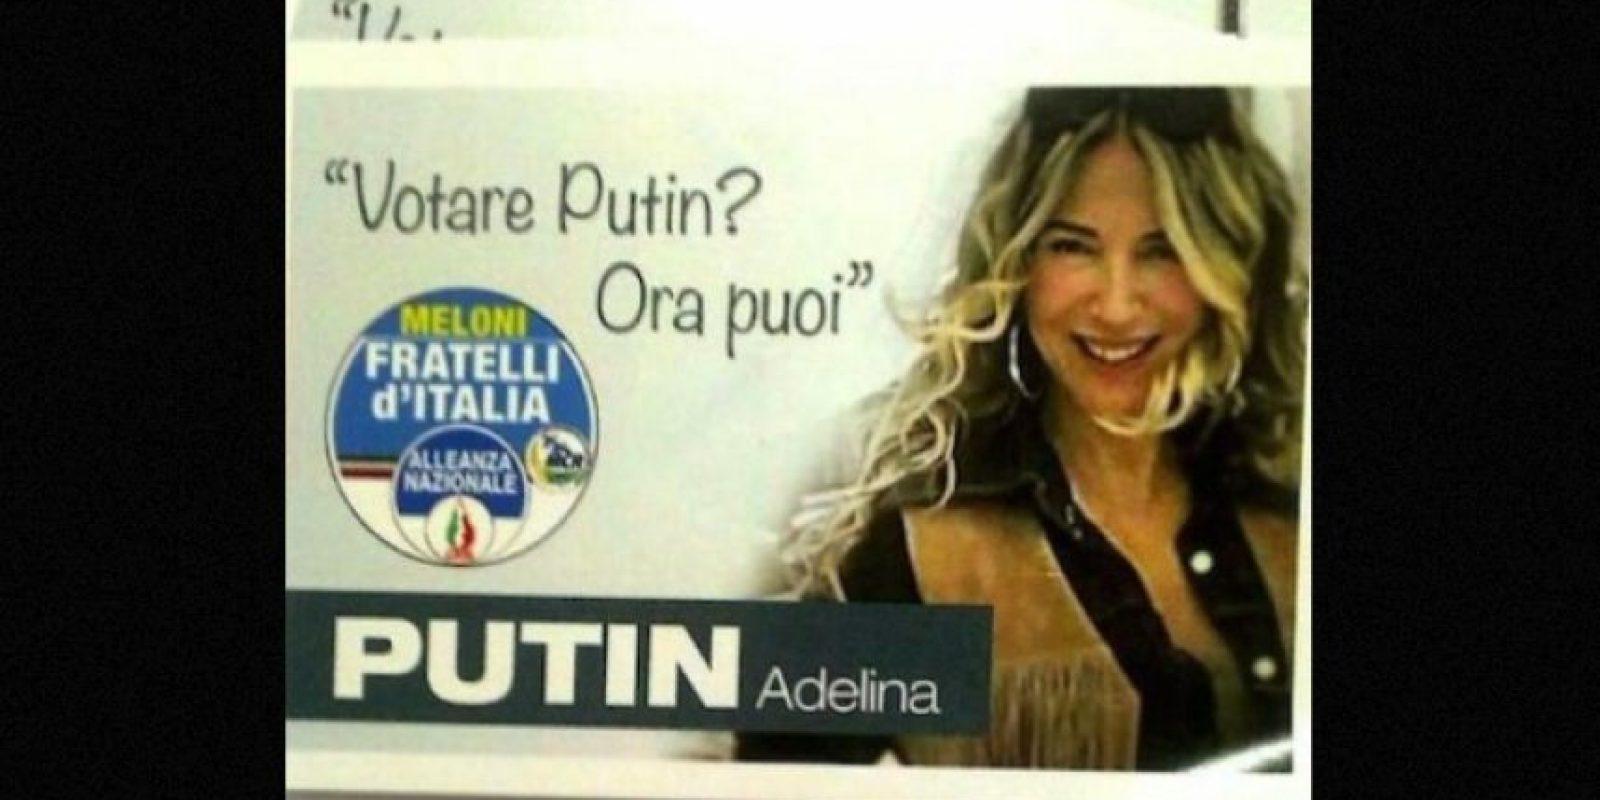 2. Adelina Putin: Italia Foto:Instagram.com/Adeputin